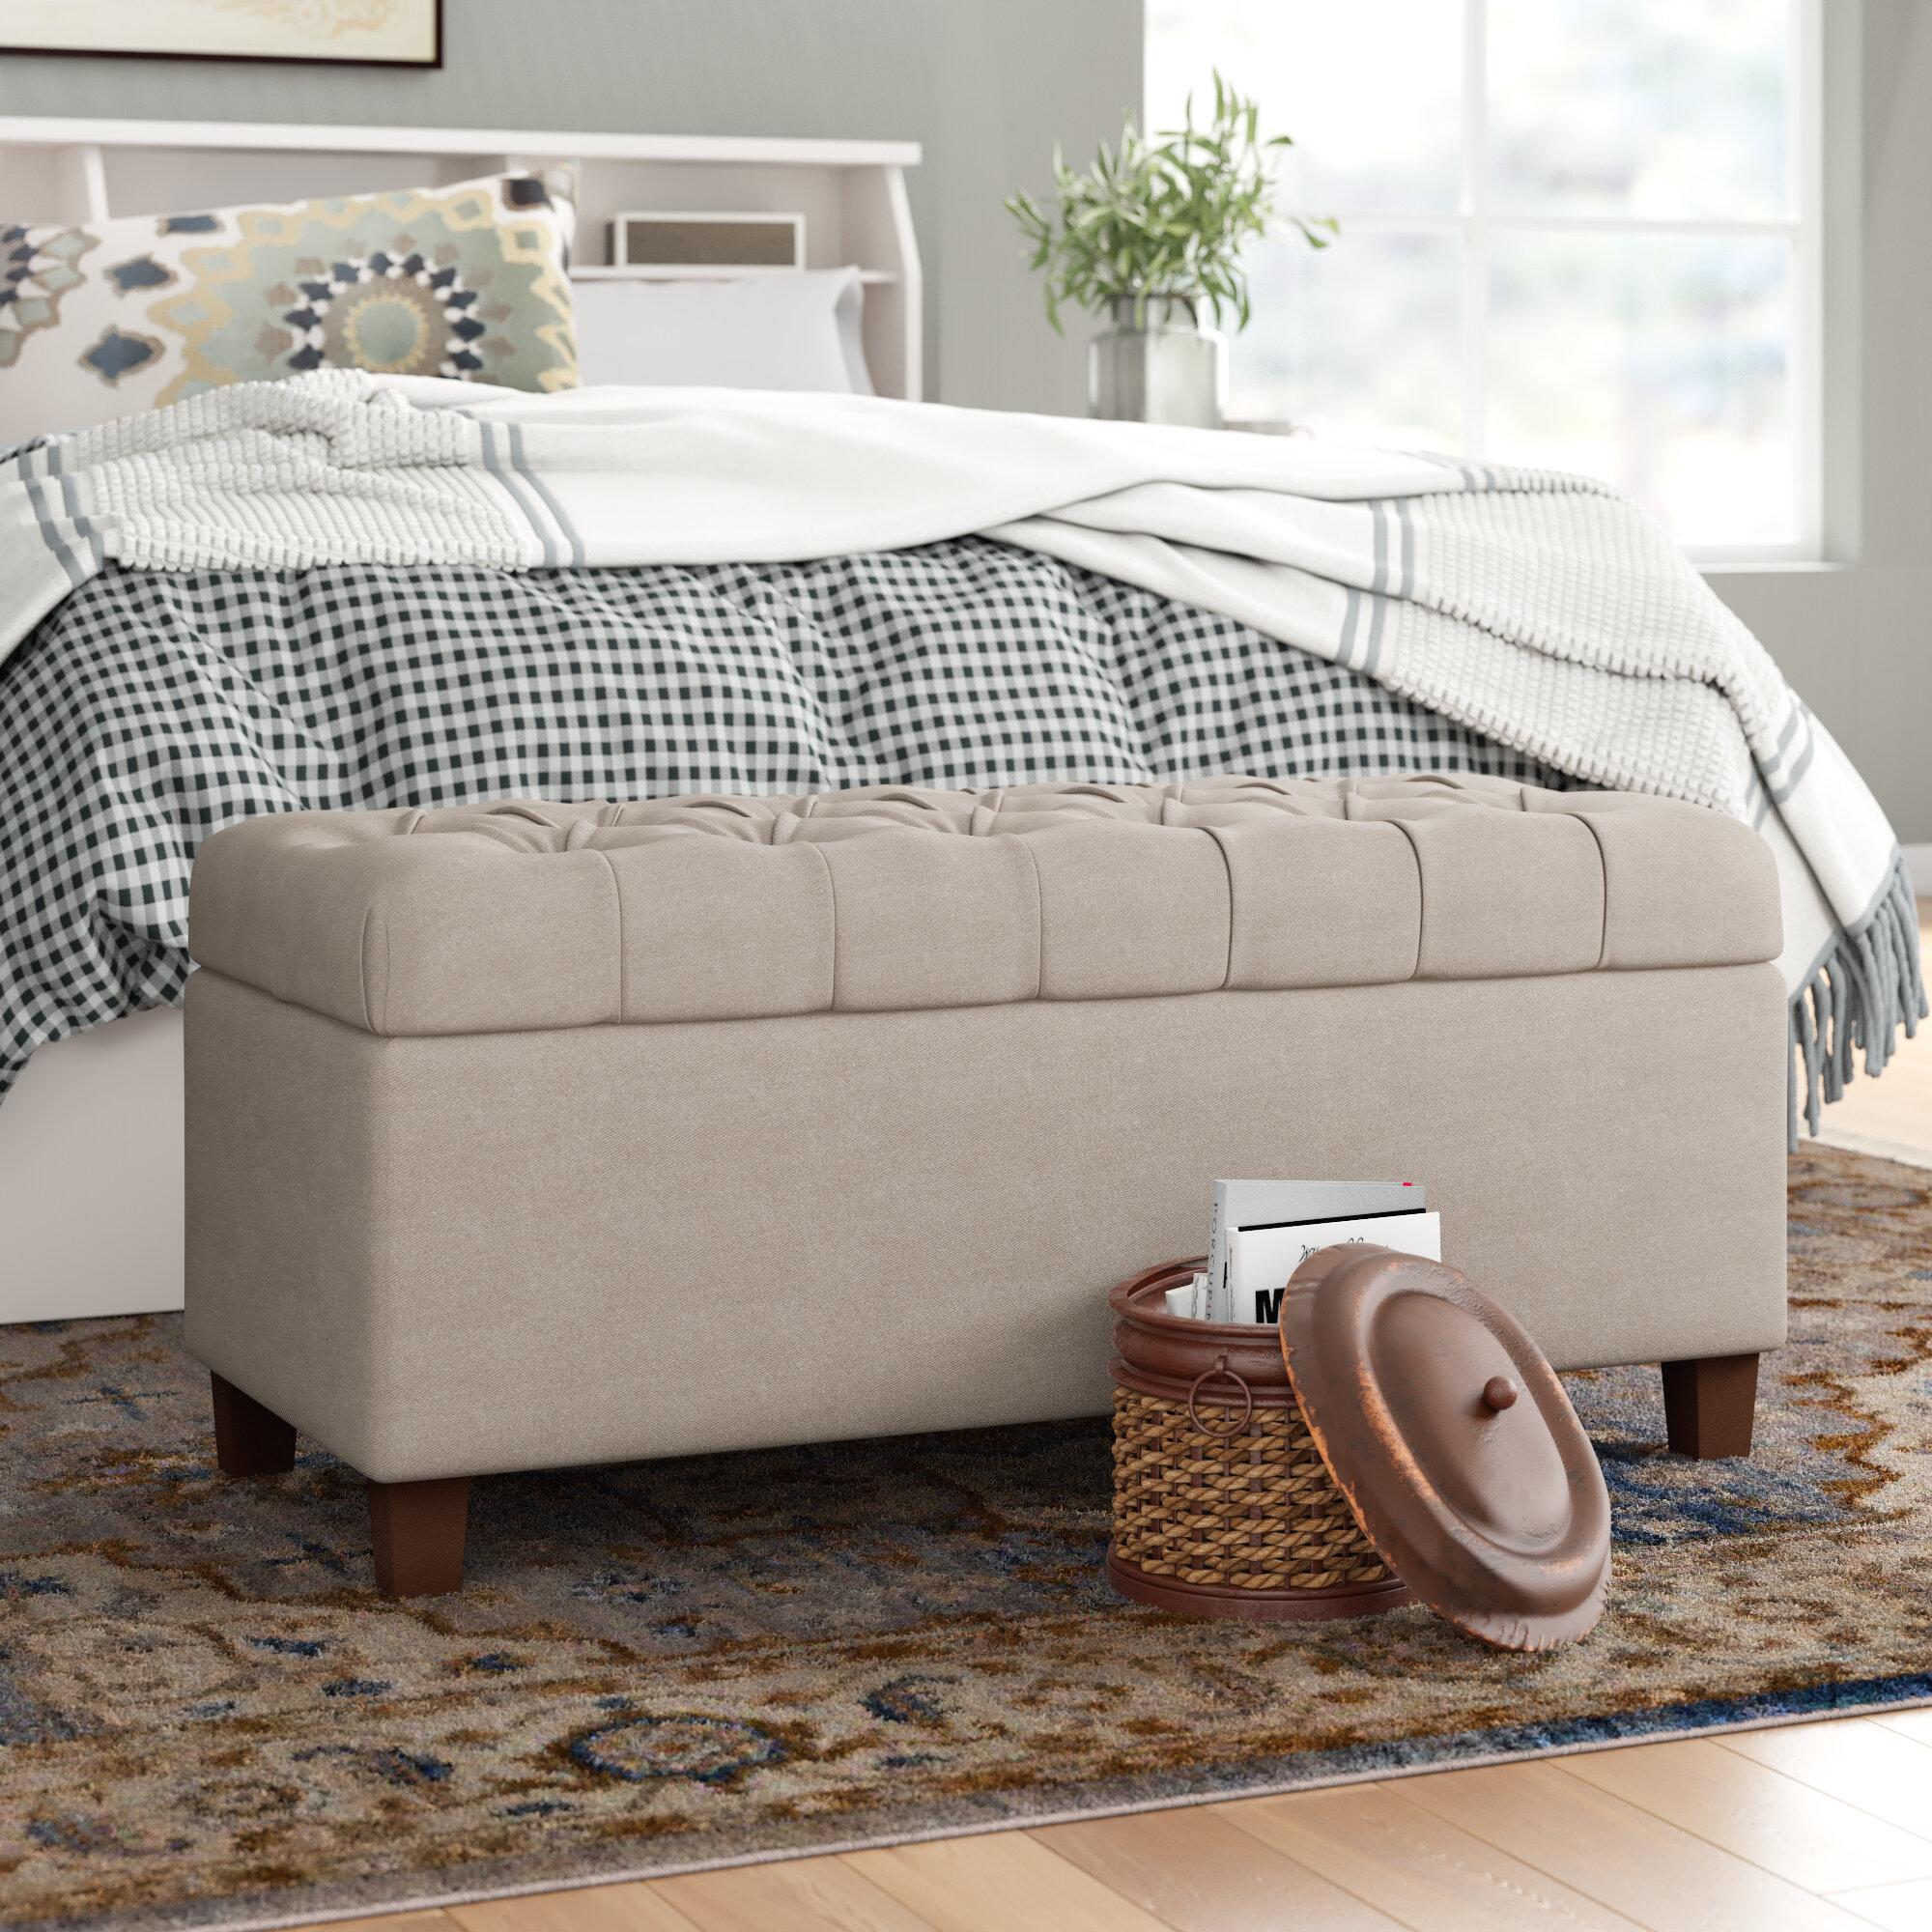 Ranshaw Fabric Upholstered Storage Bench